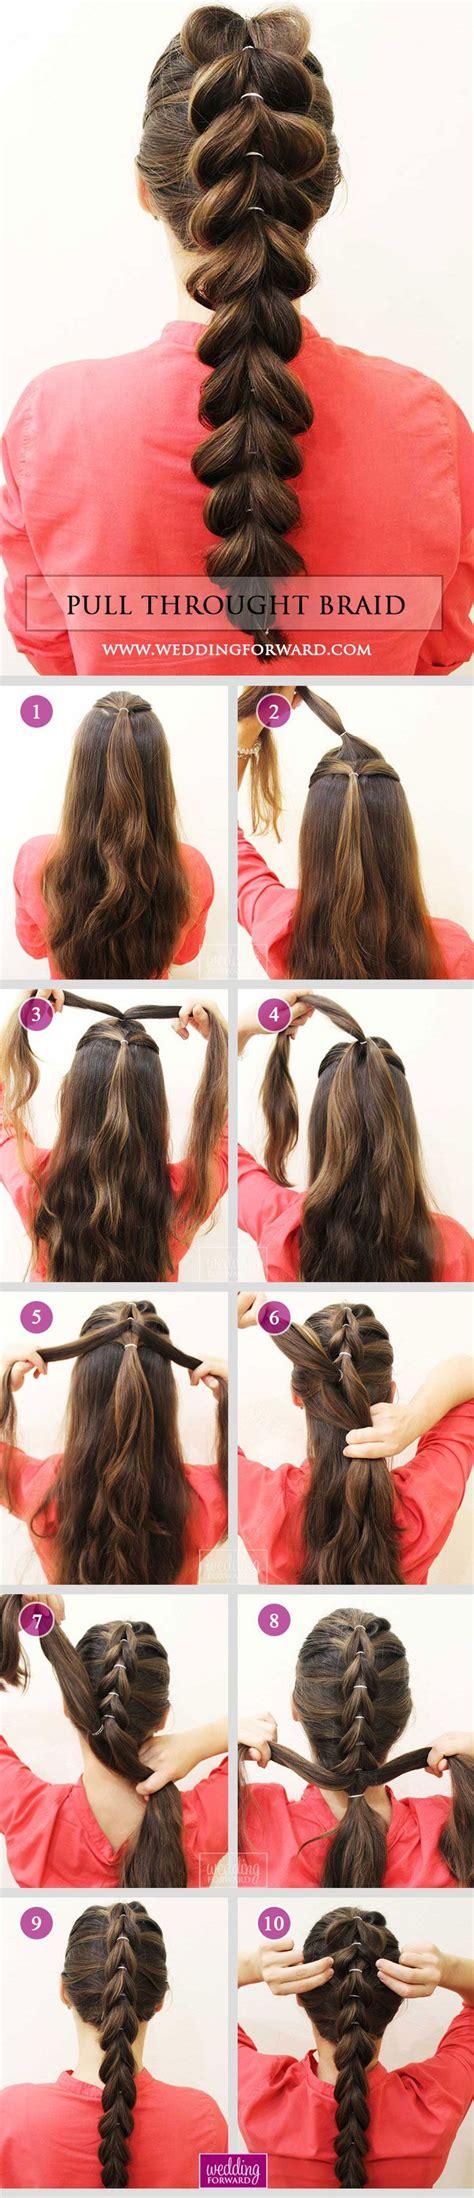 diy hairstyles 36 braided wedding hair ideas you will love more braided